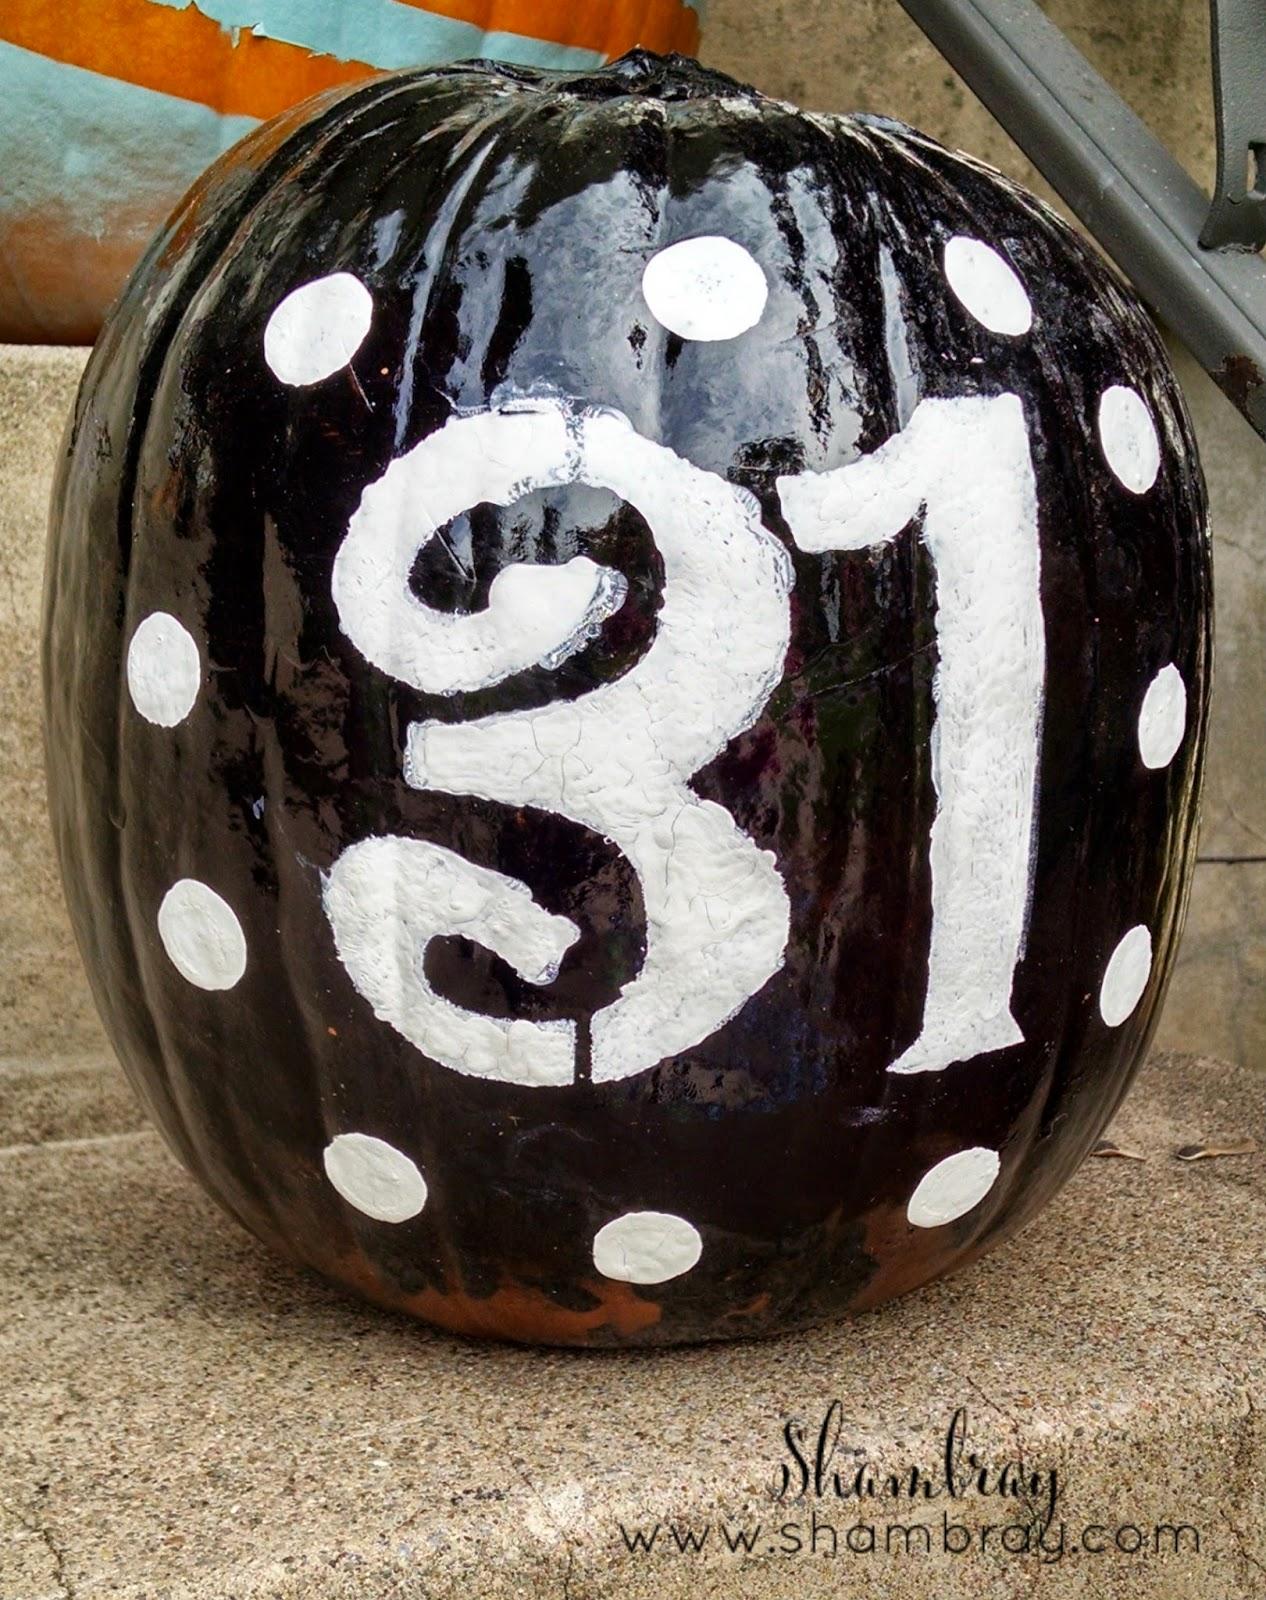 Decorating Pumpkins  | Halloween Favorites at www.andersonandgrant.com